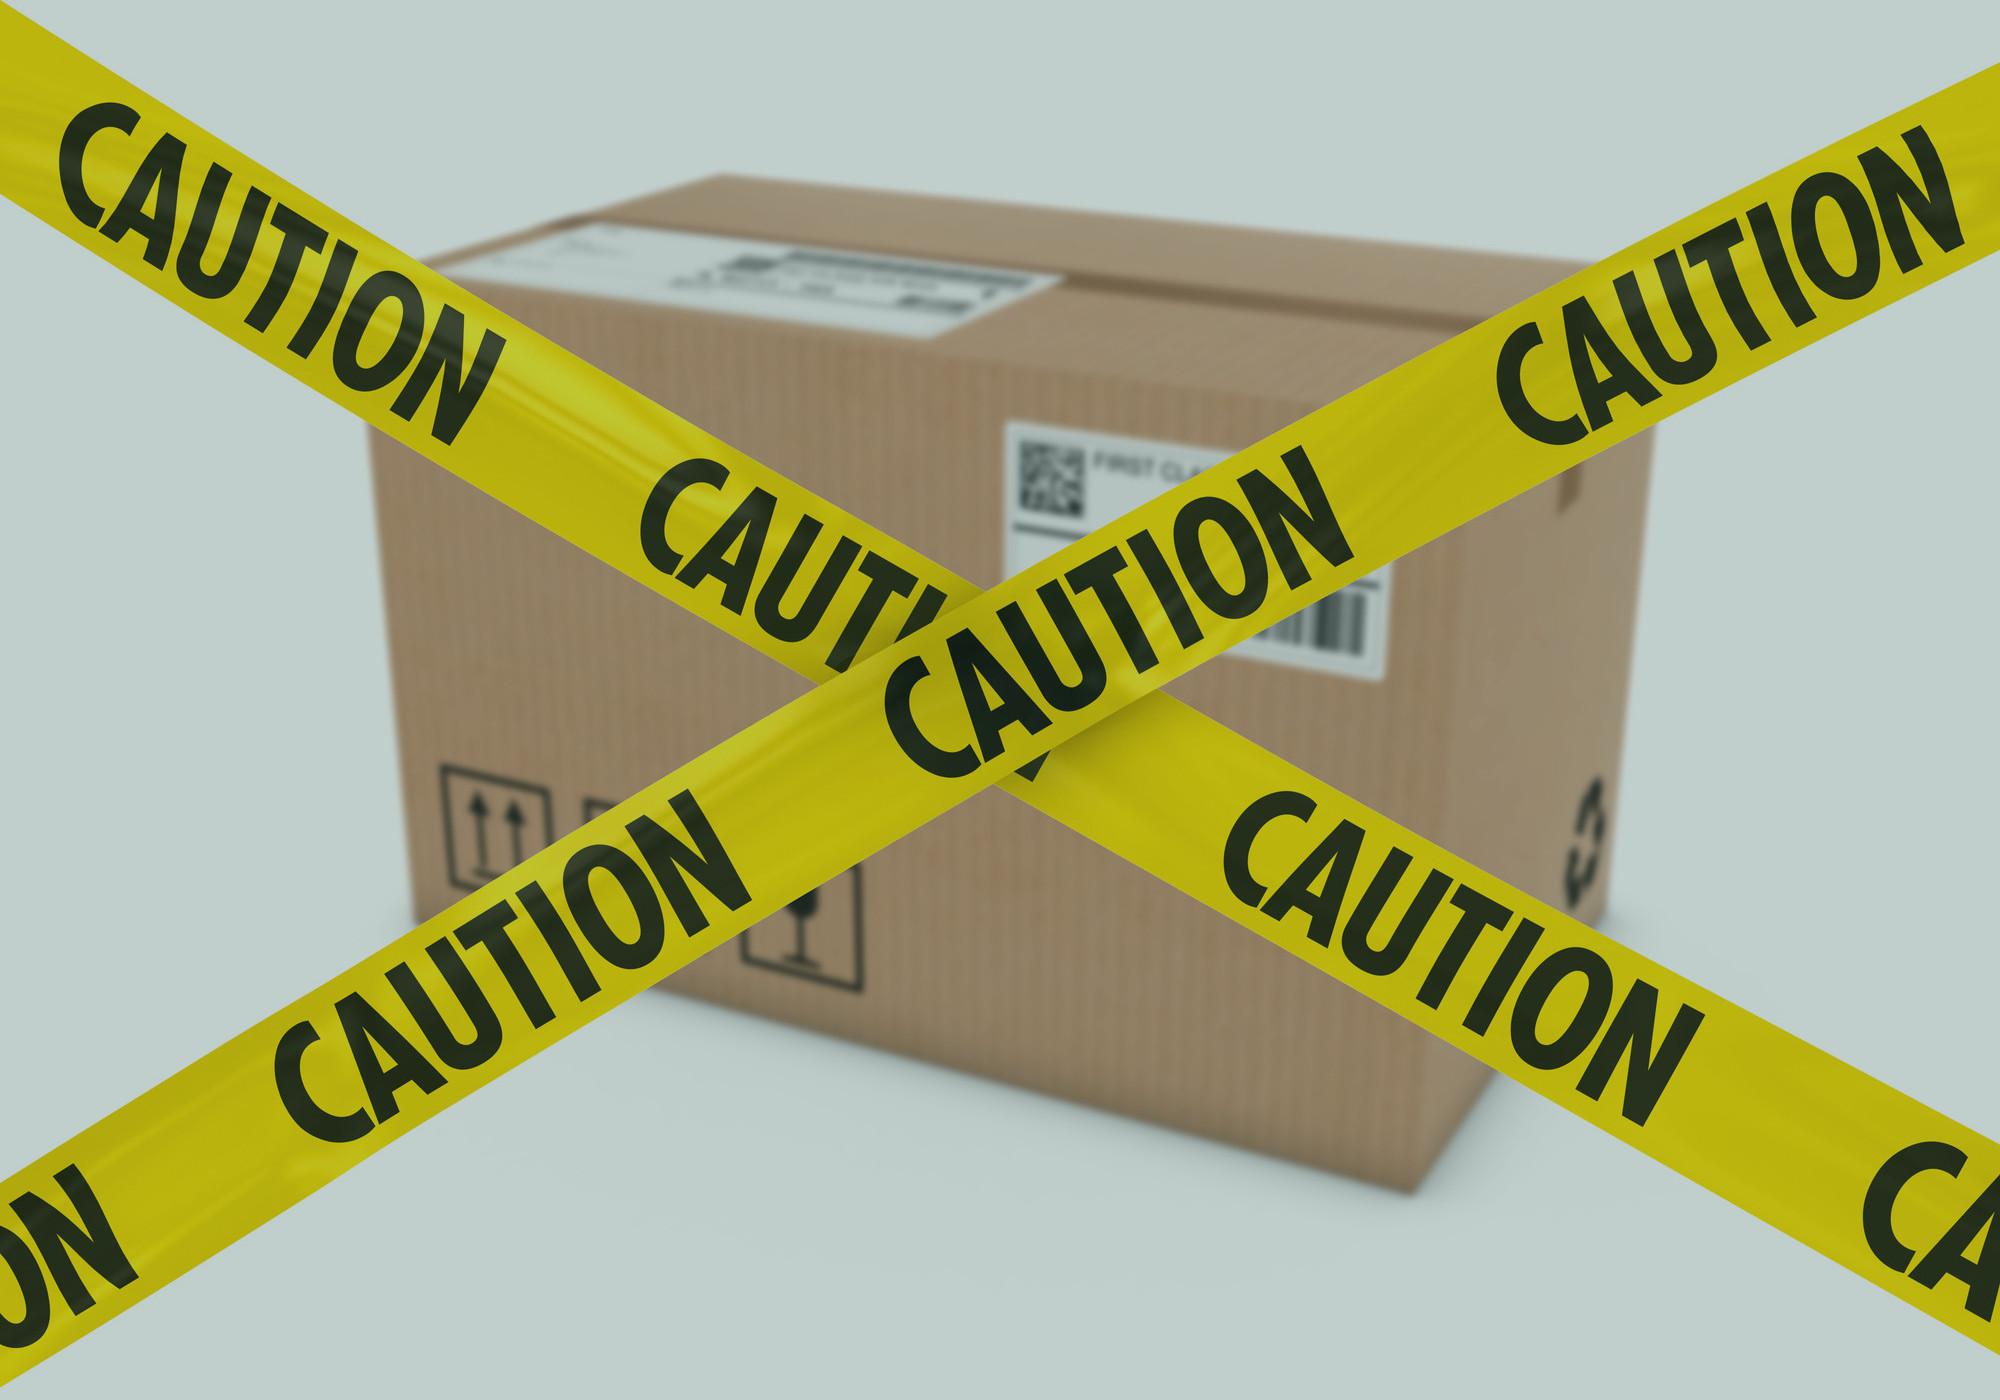 Cardboard Box Behind Caution Tape Cross